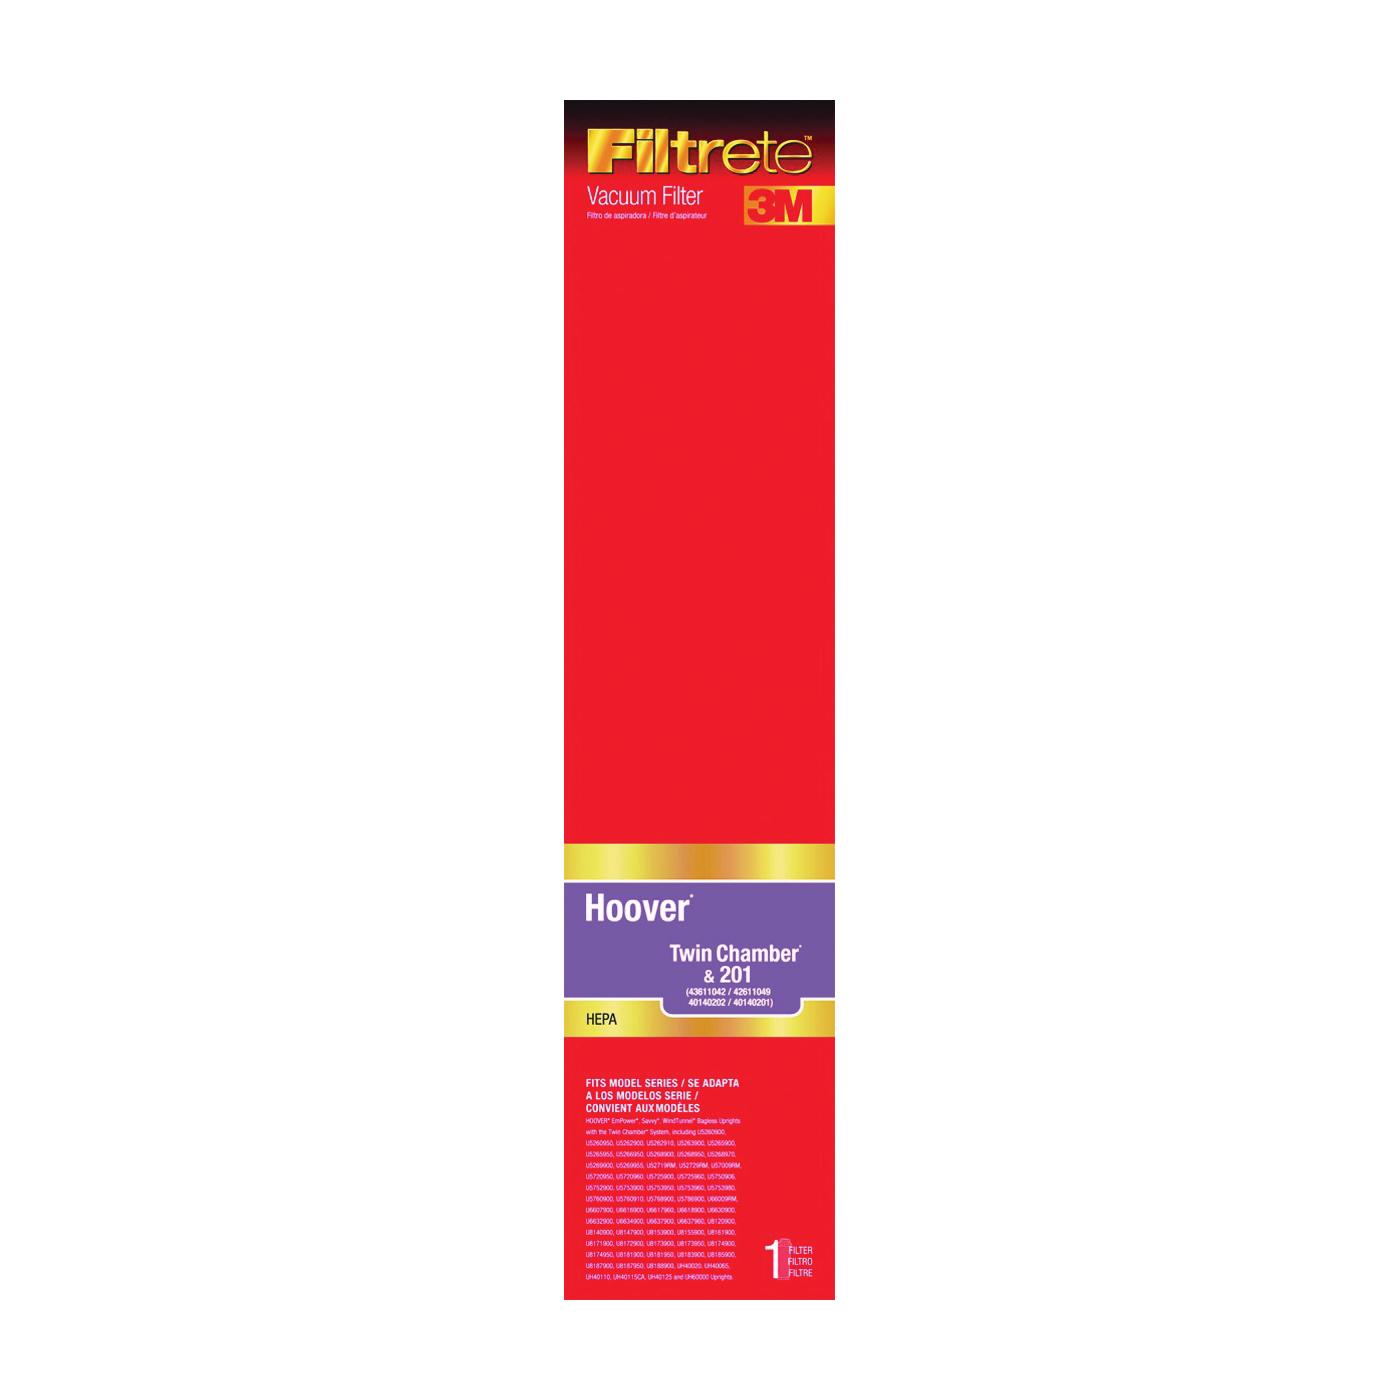 Picture of Filtrete 64805B-2 Vacuum Cleaner Filter